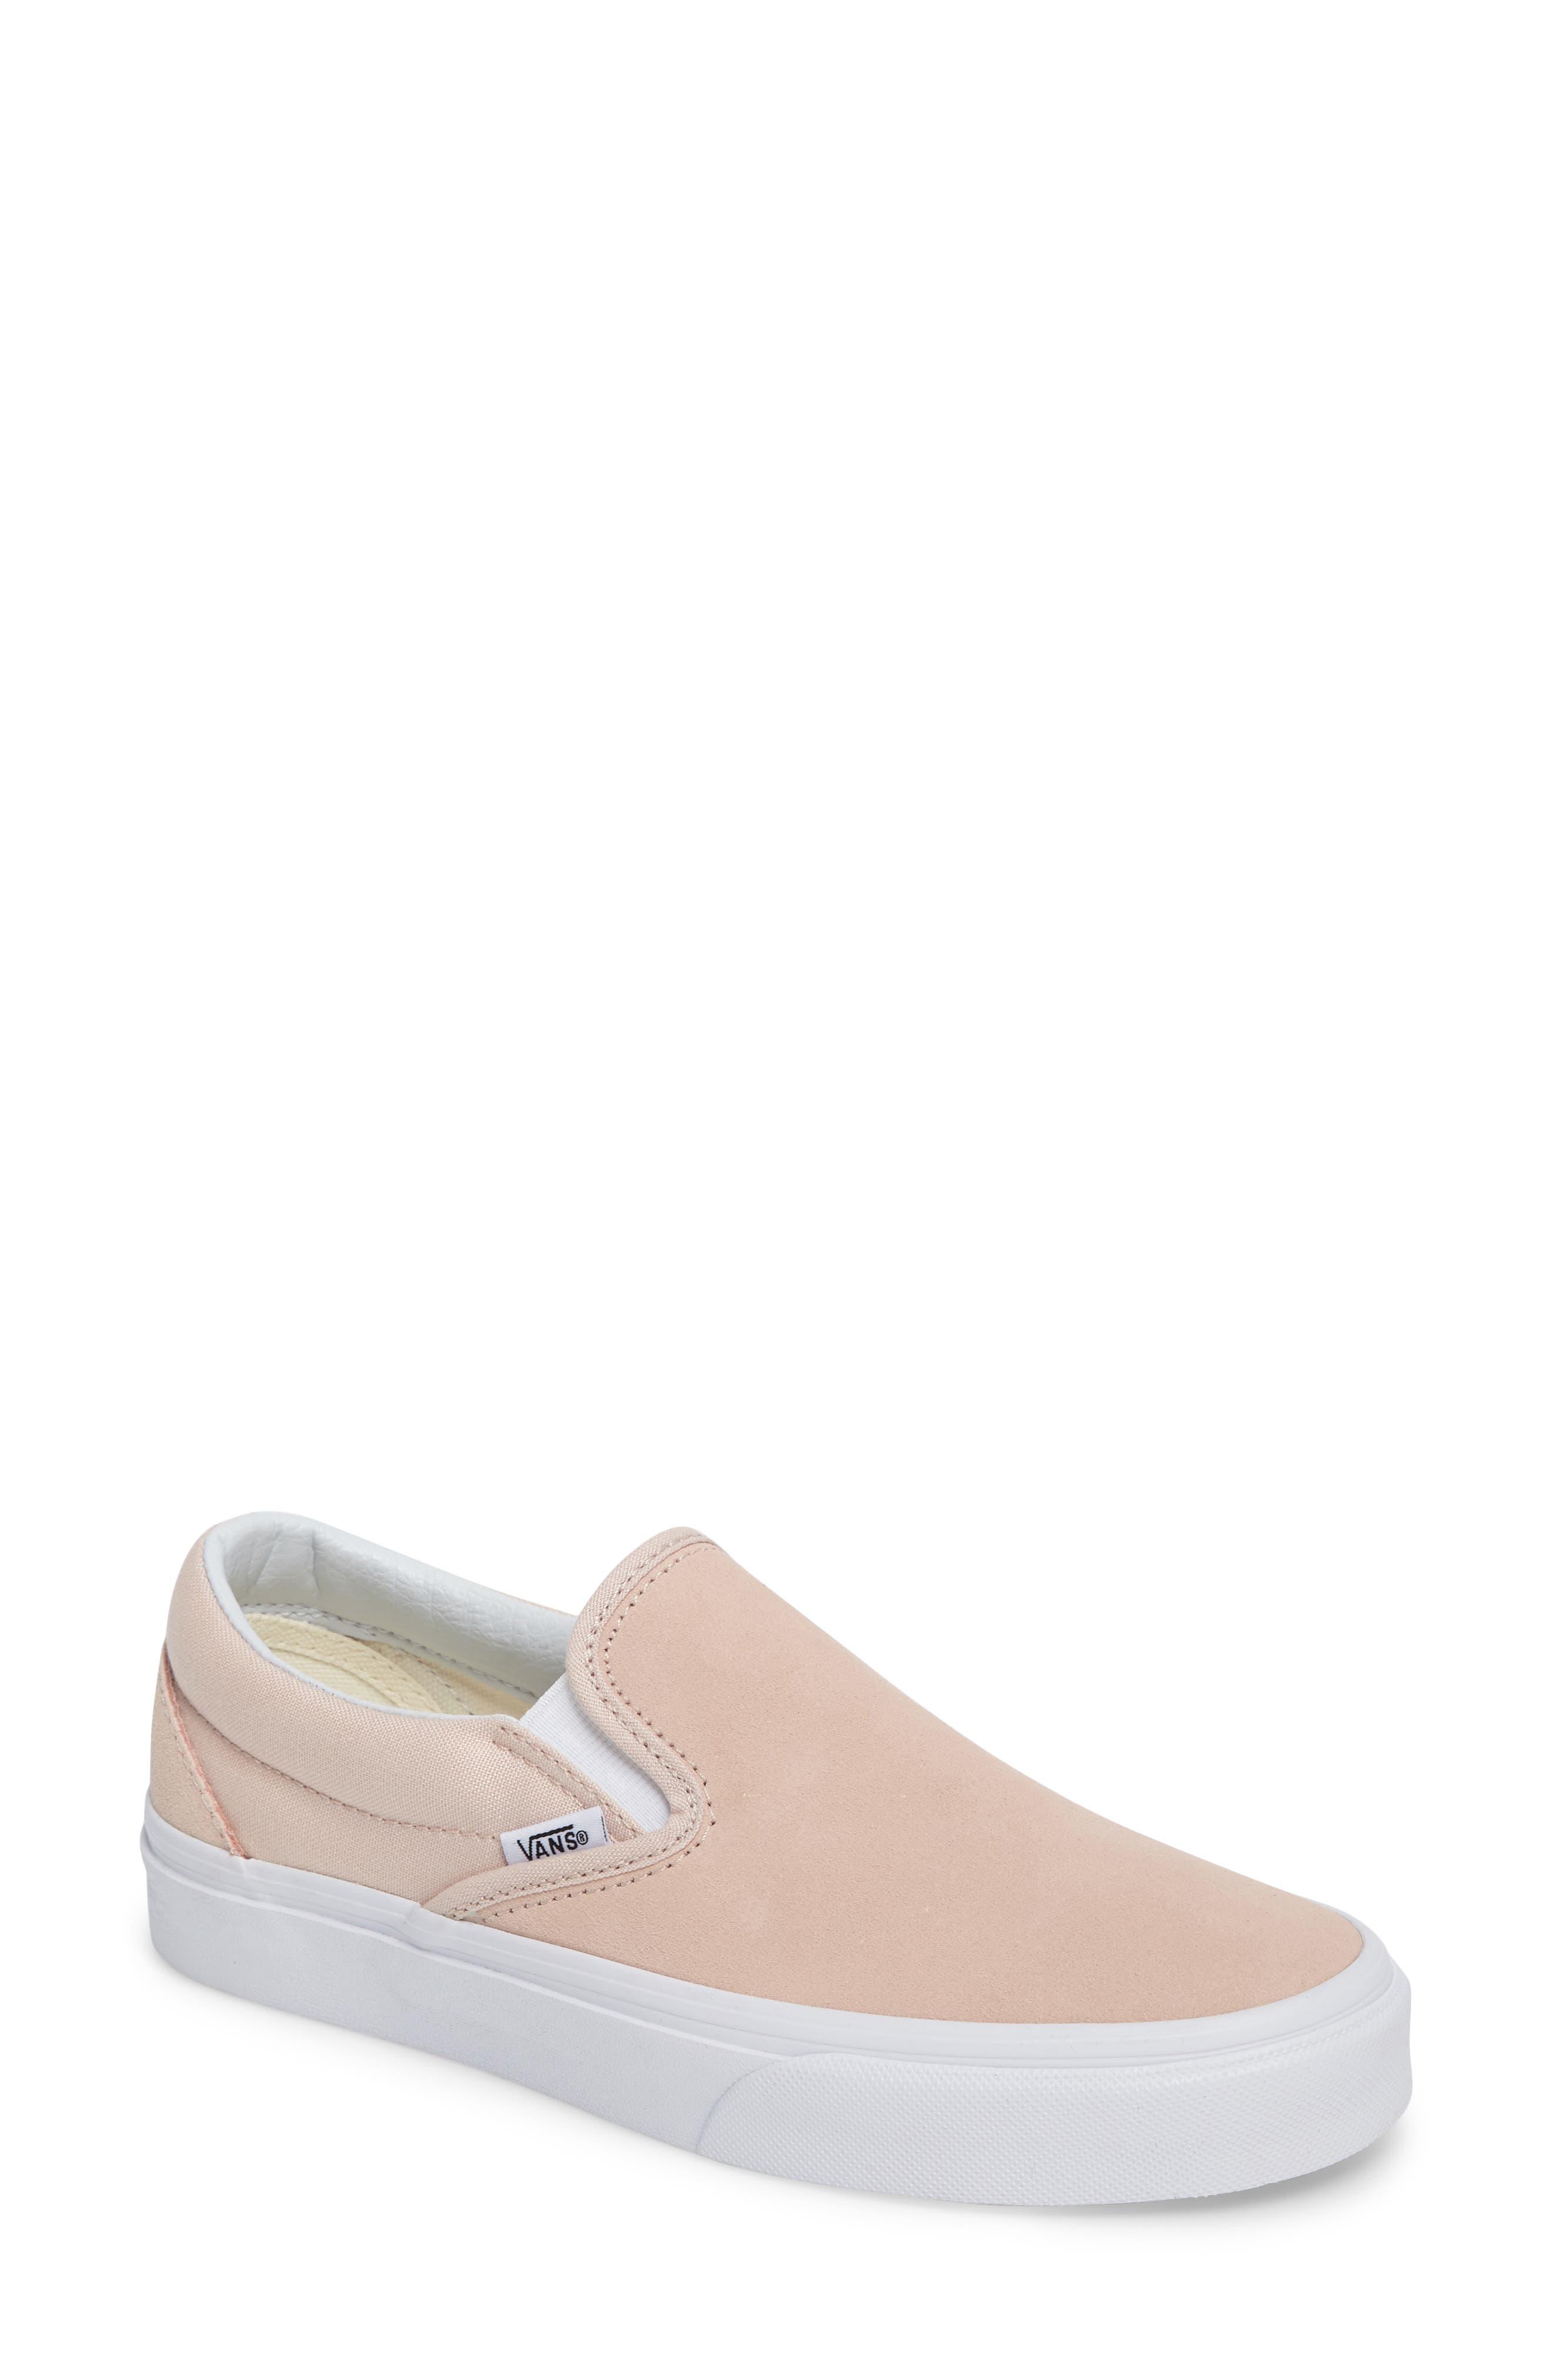 ,                             Classic Slip-On Sneaker,                             Main thumbnail 418, color,                             657